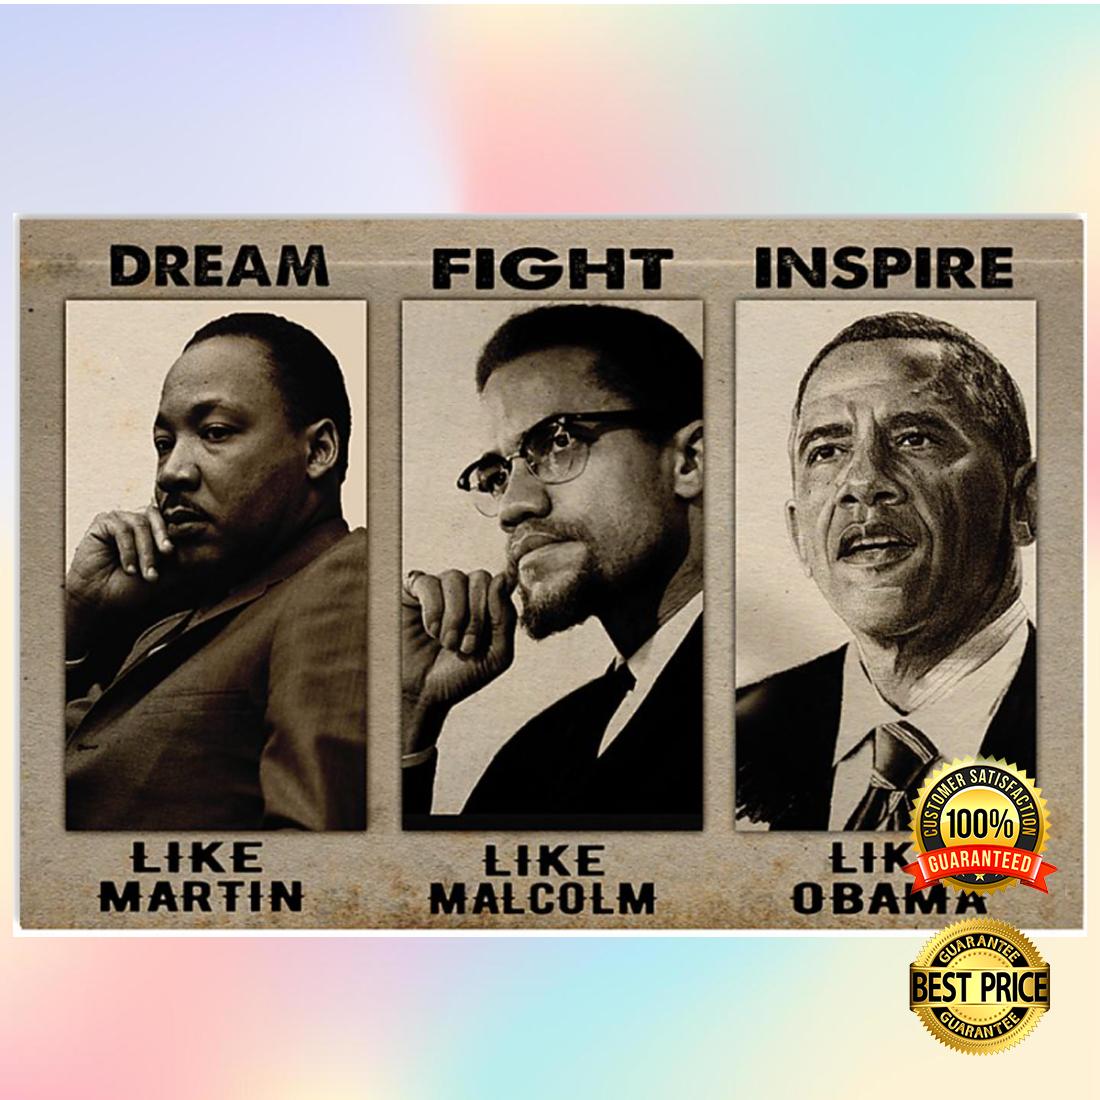 Dream like martin fight like malcolm inspire like obama poster 4